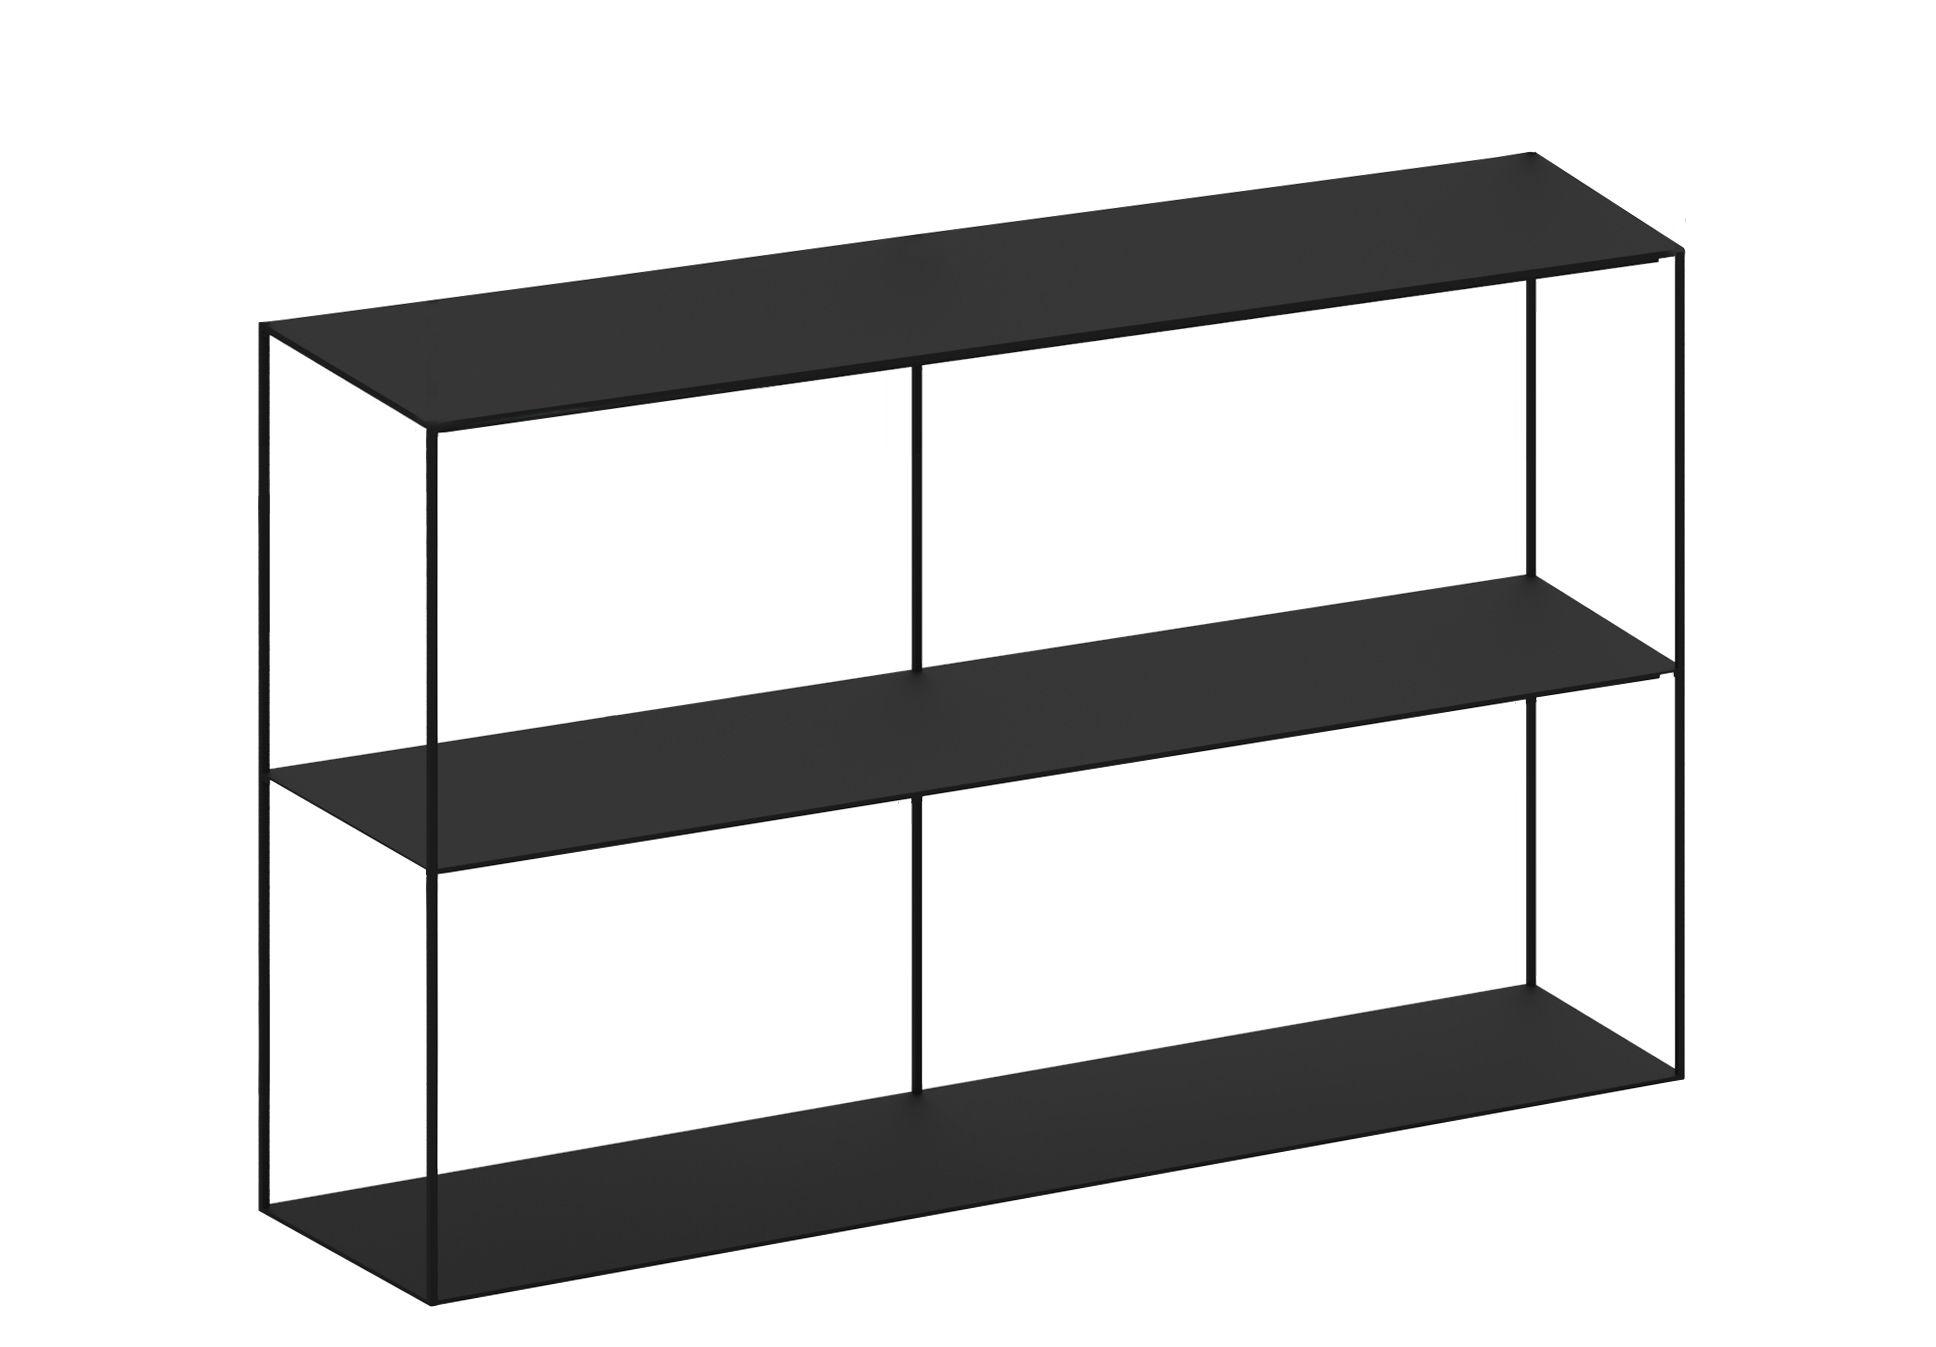 Furniture - Bookcases & Bookshelves - Slim Irony Shelf - L 124 cm x H 82 cm by Zeus - Black copper - Painted steel